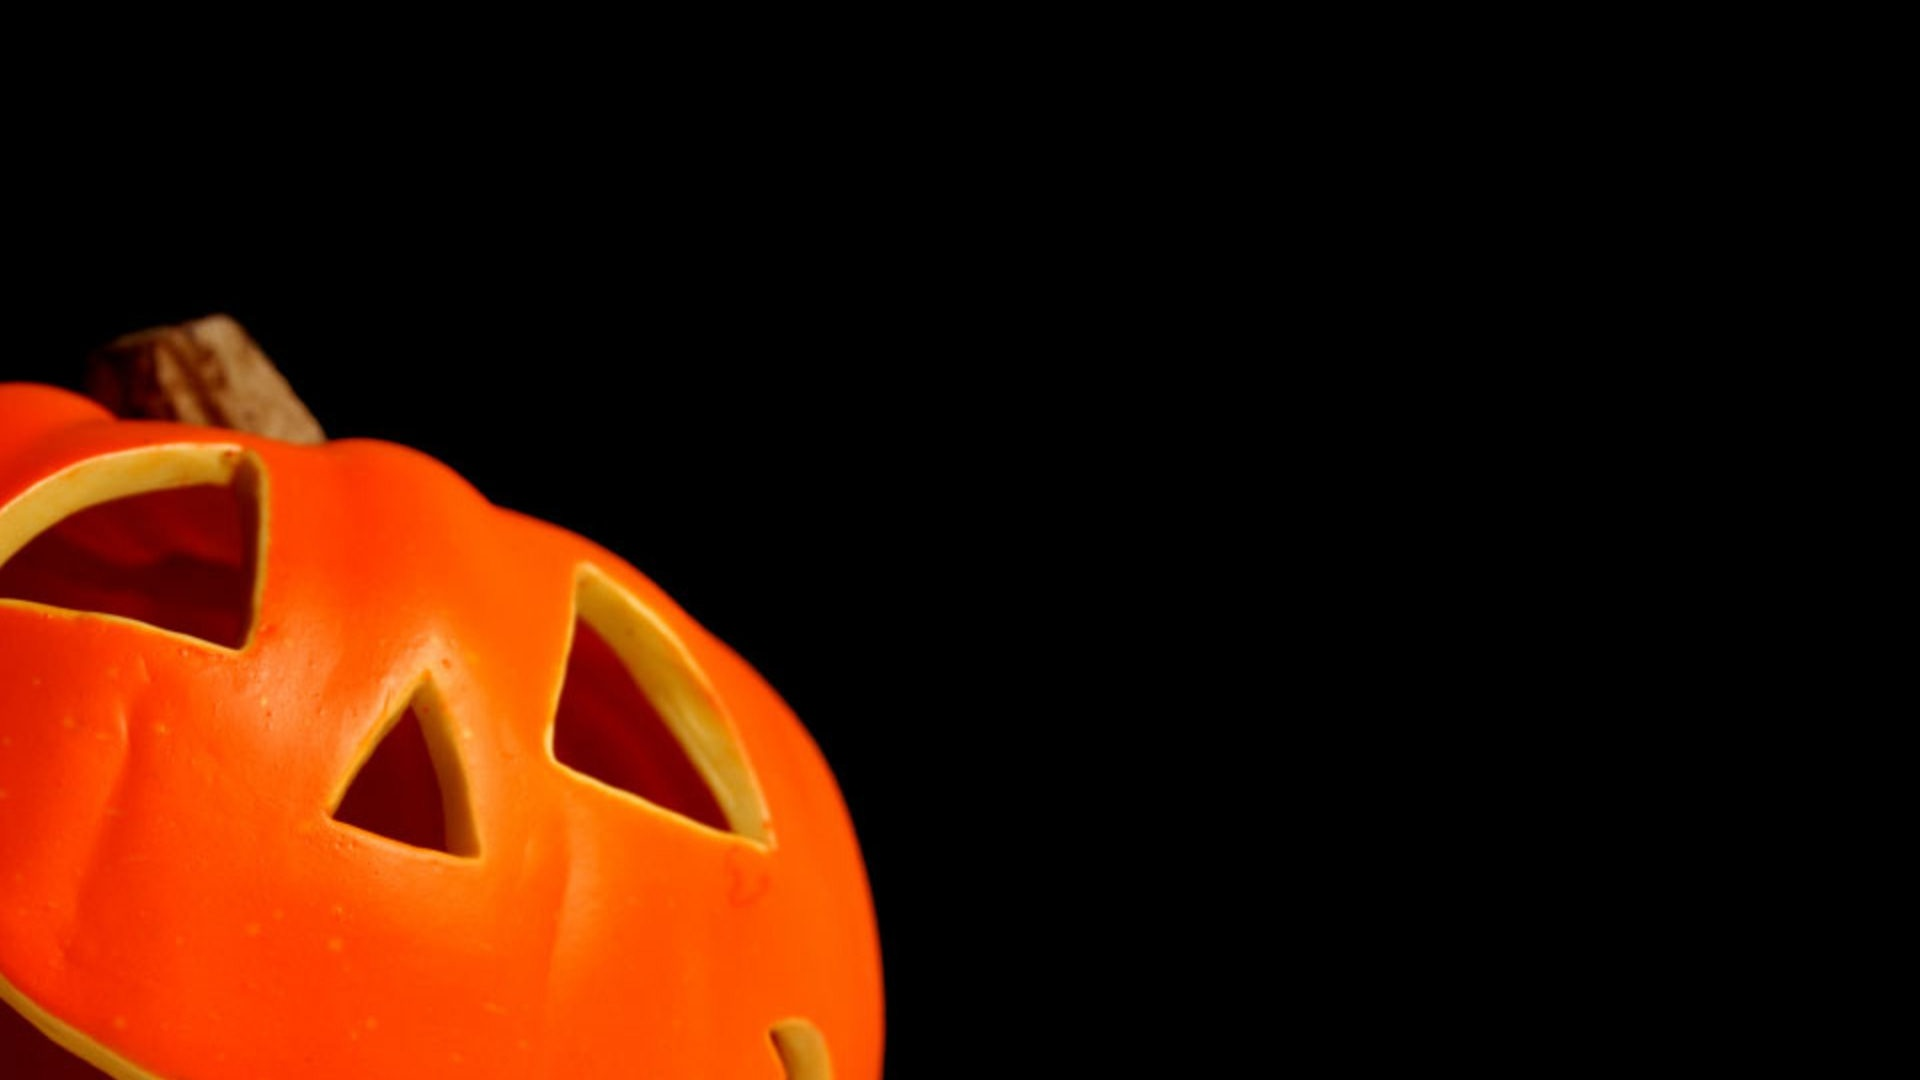 Cute Halloween Desktop Wallpapers Top Free Cute Halloween Desktop